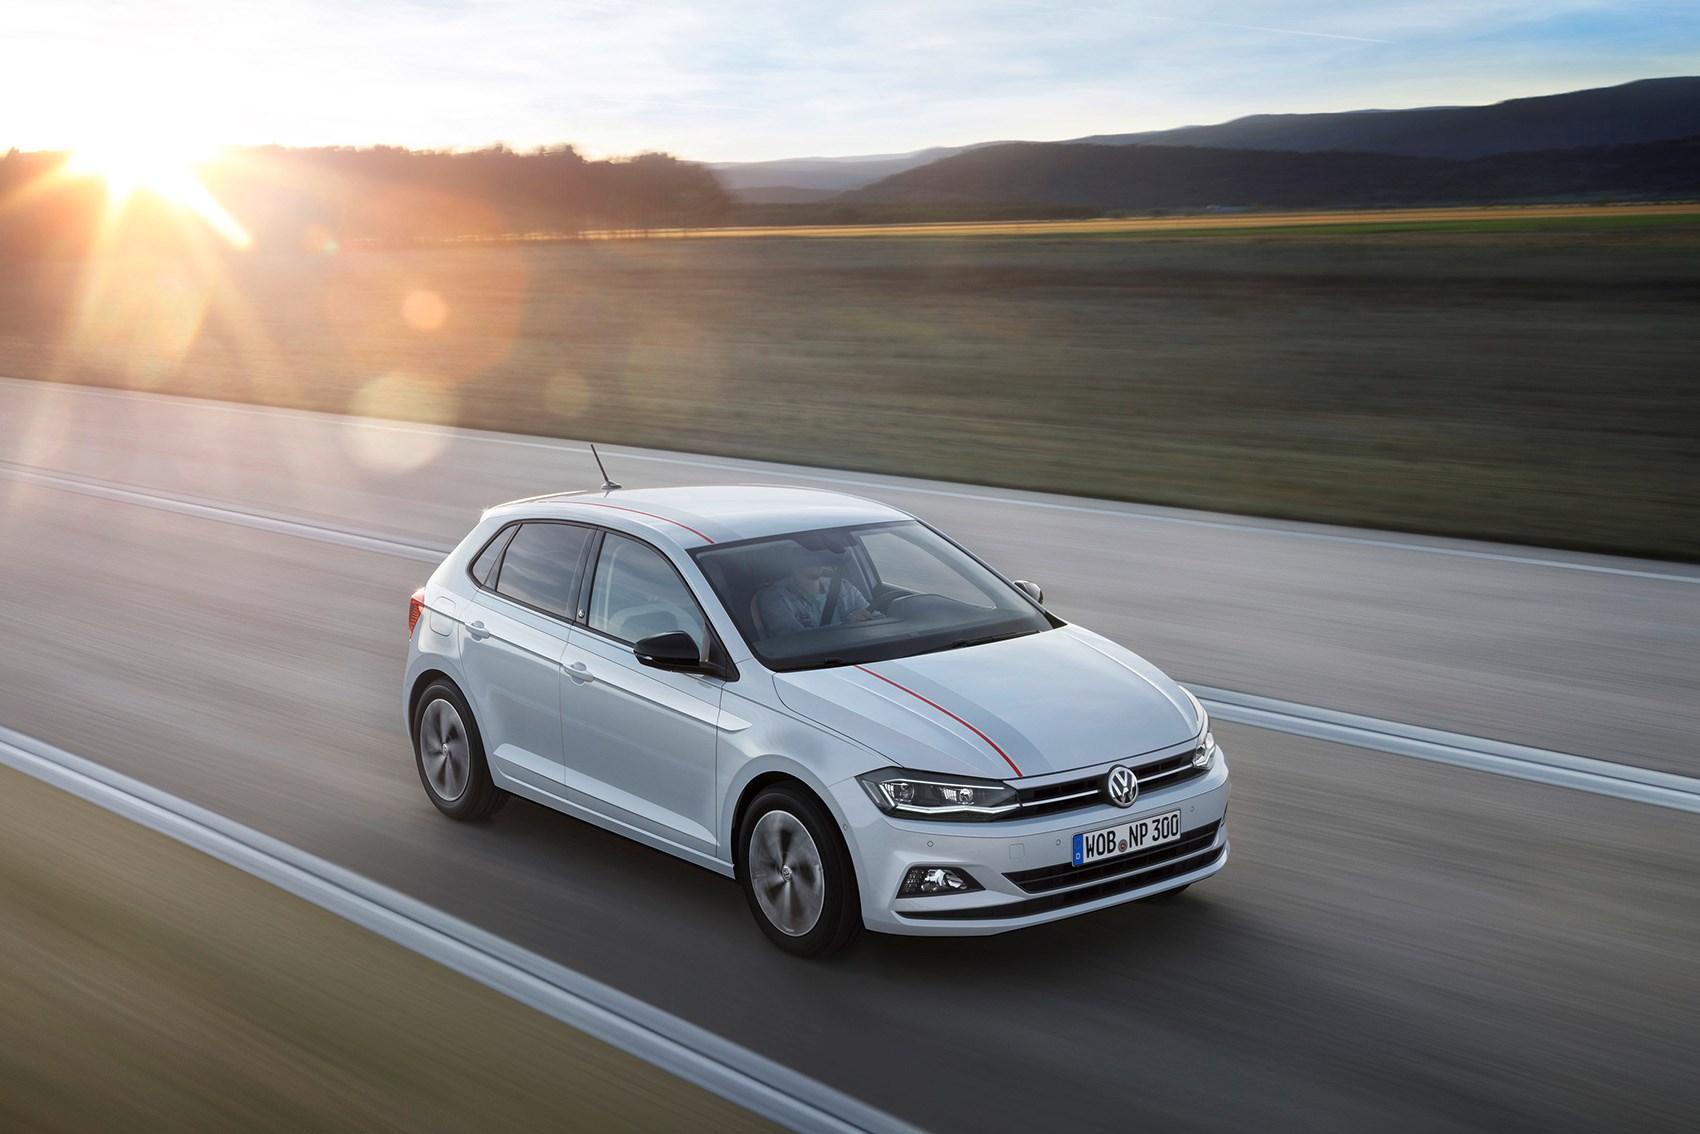 New VW Polo world premiere